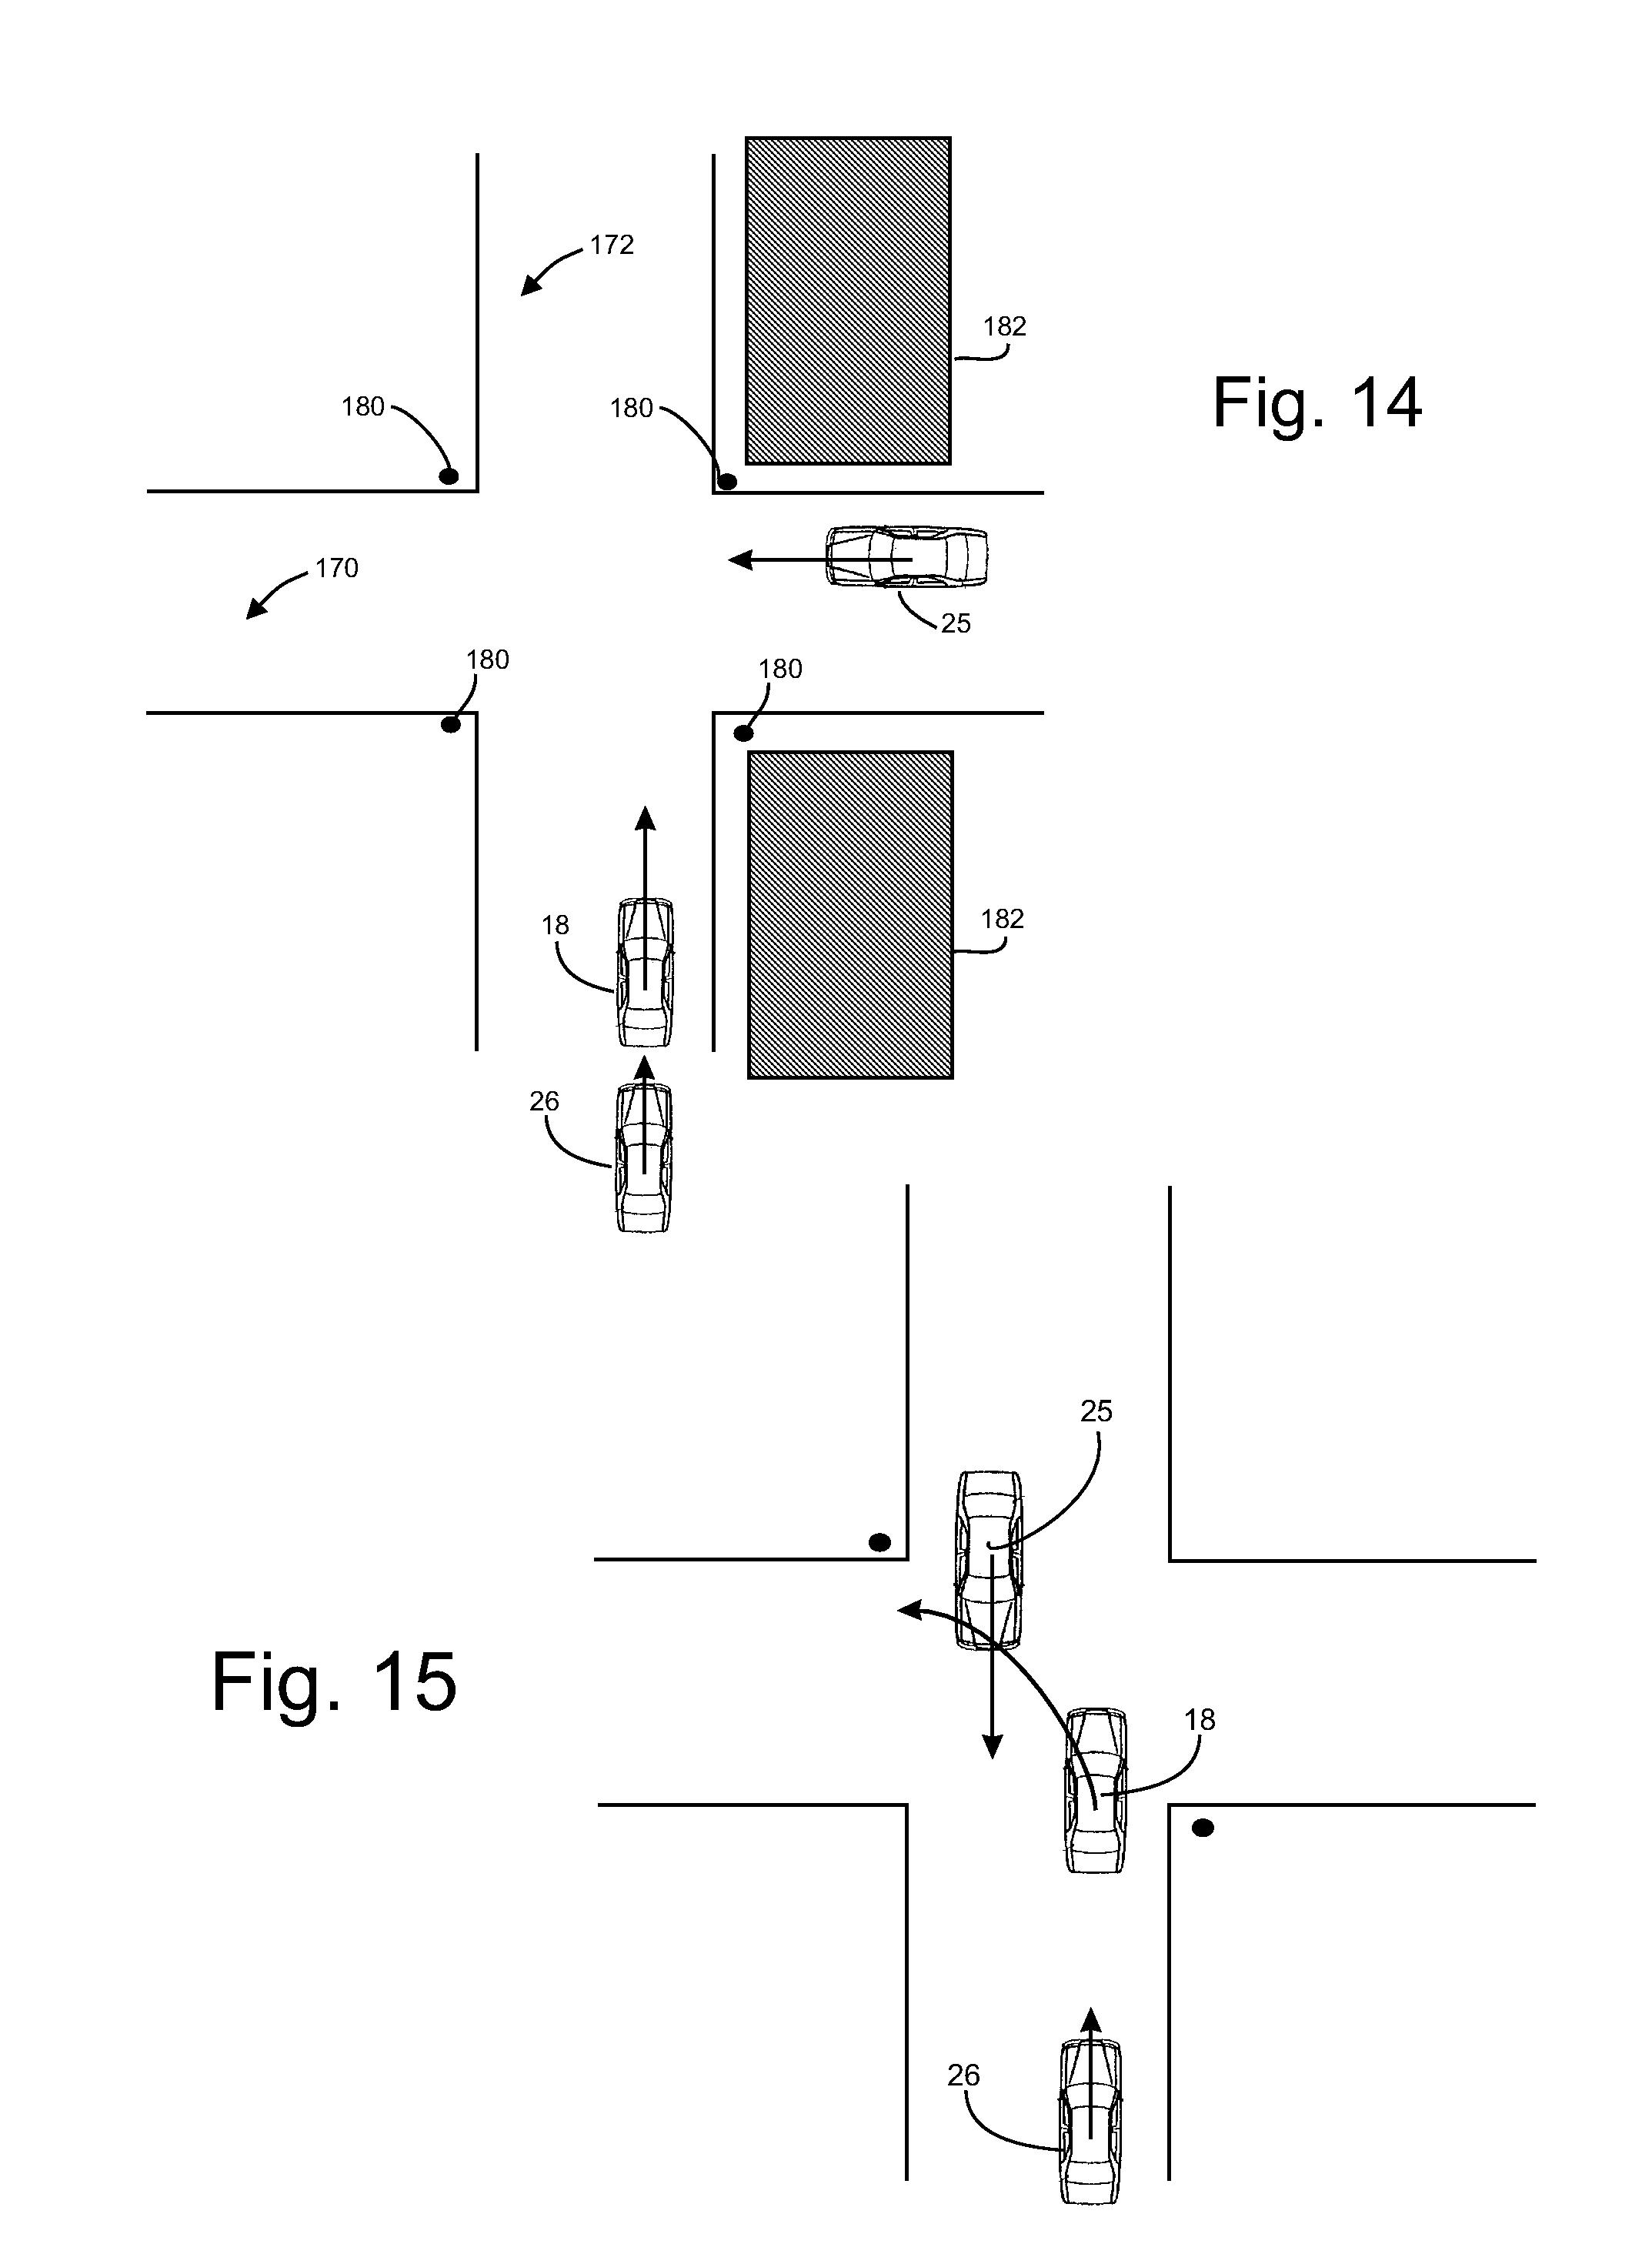 Audio Mixer Circuit Diagram Tradeoficcom Data Wiring Sweep Generator Twochannel